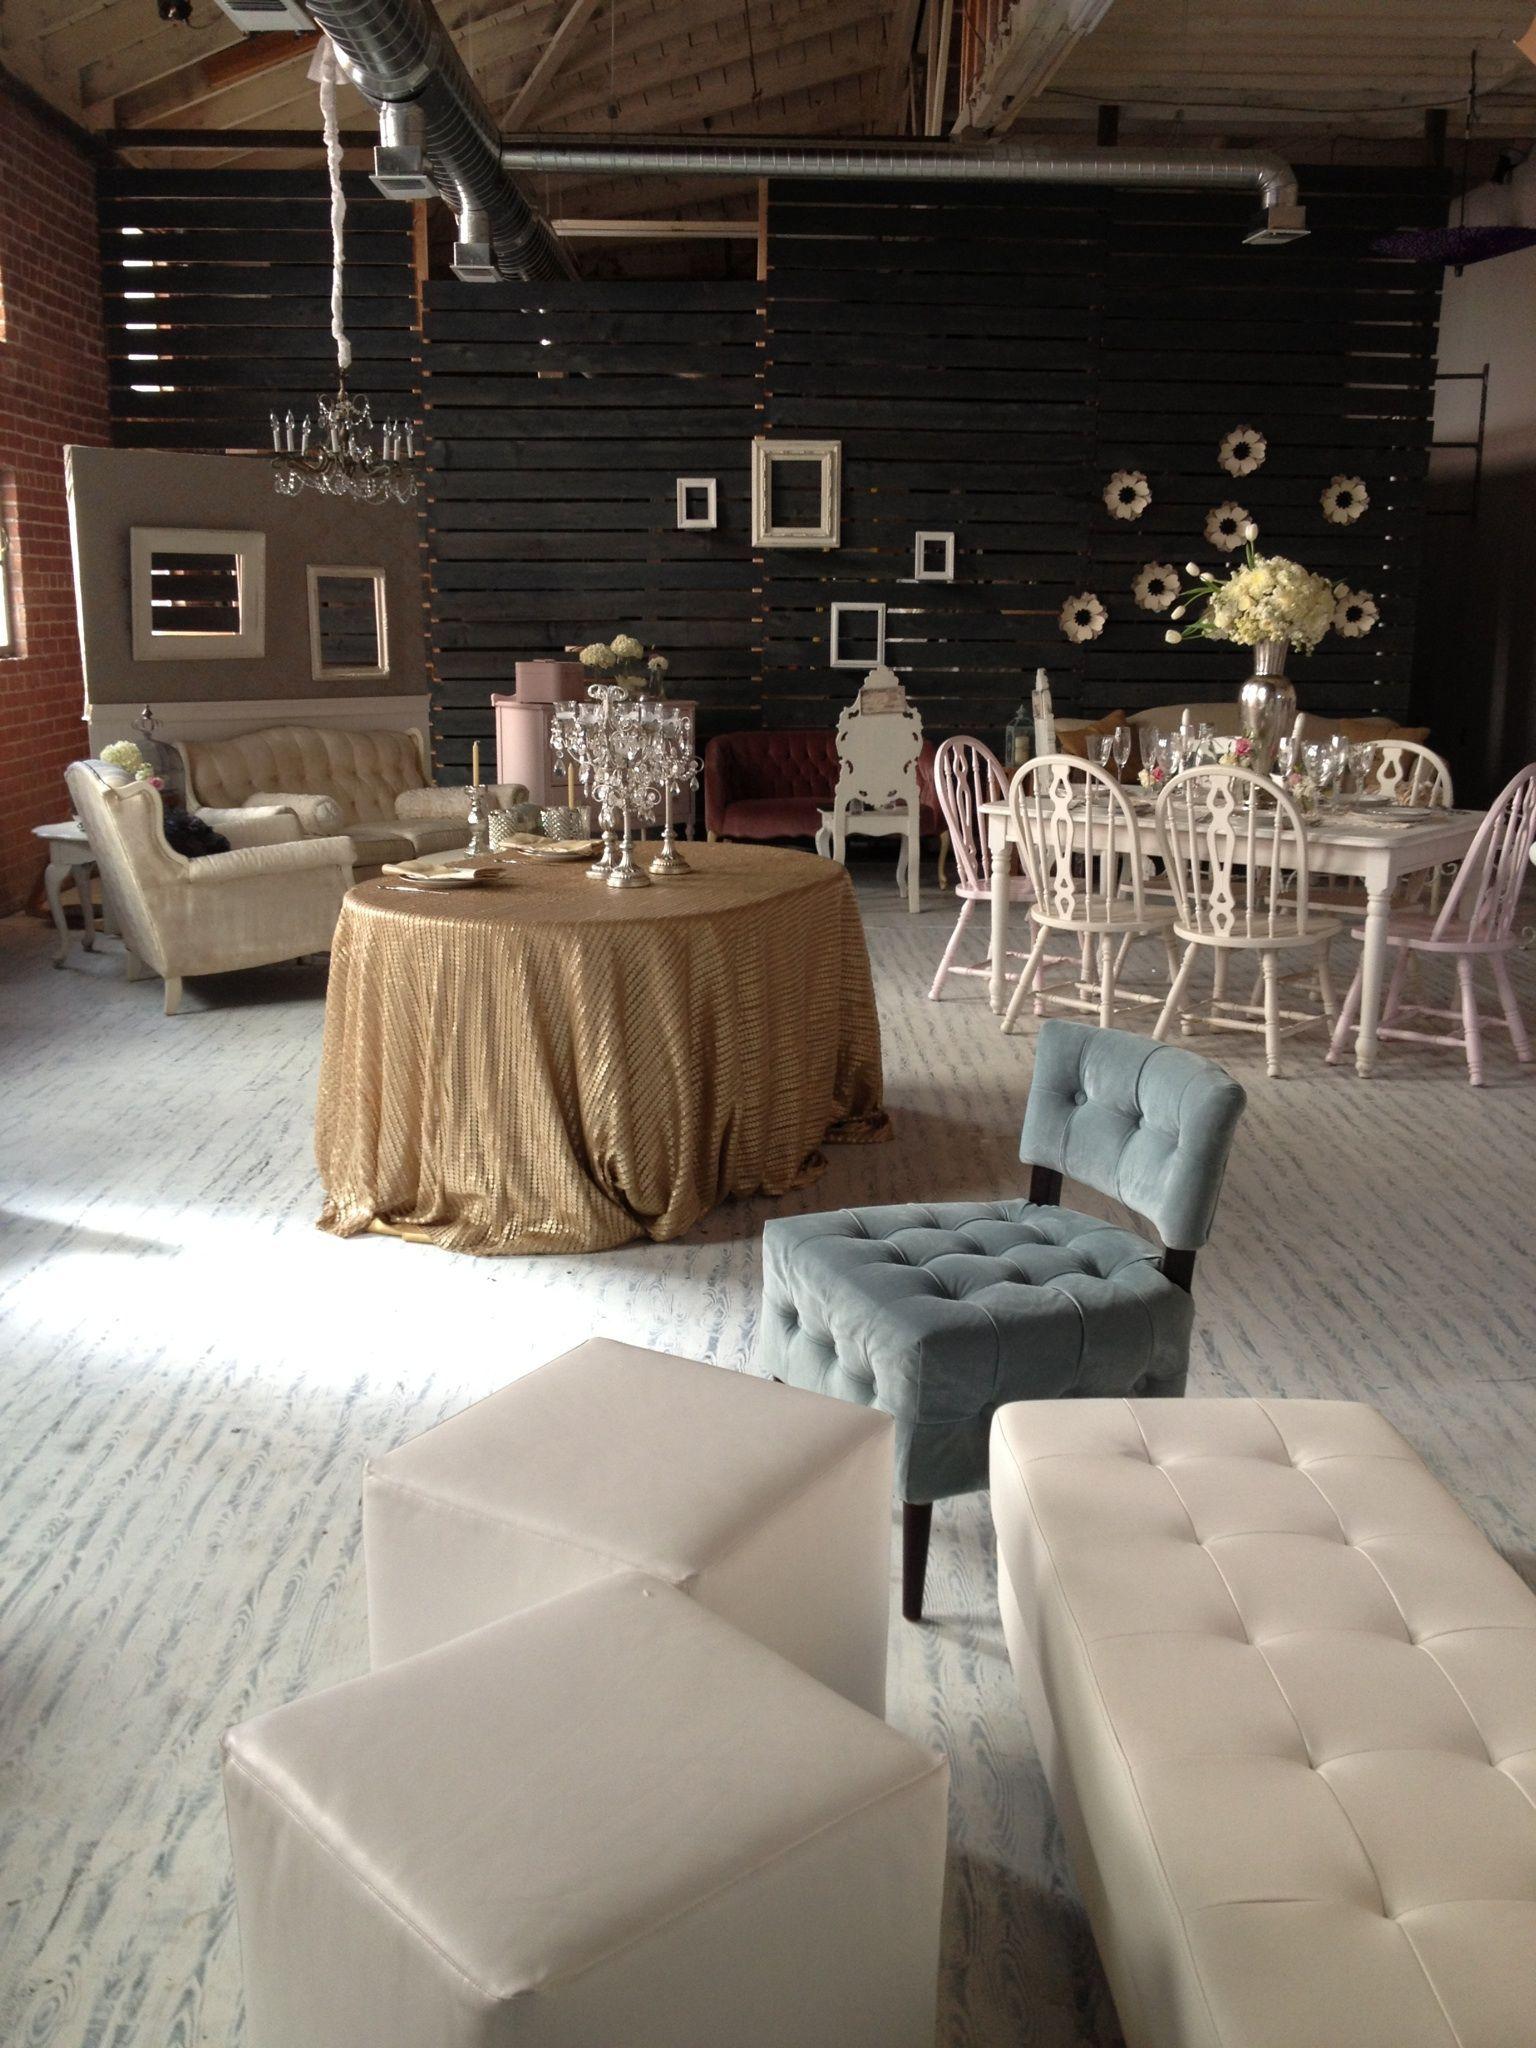 Wedding Decorations Ideas Pinterest Wedding rentals